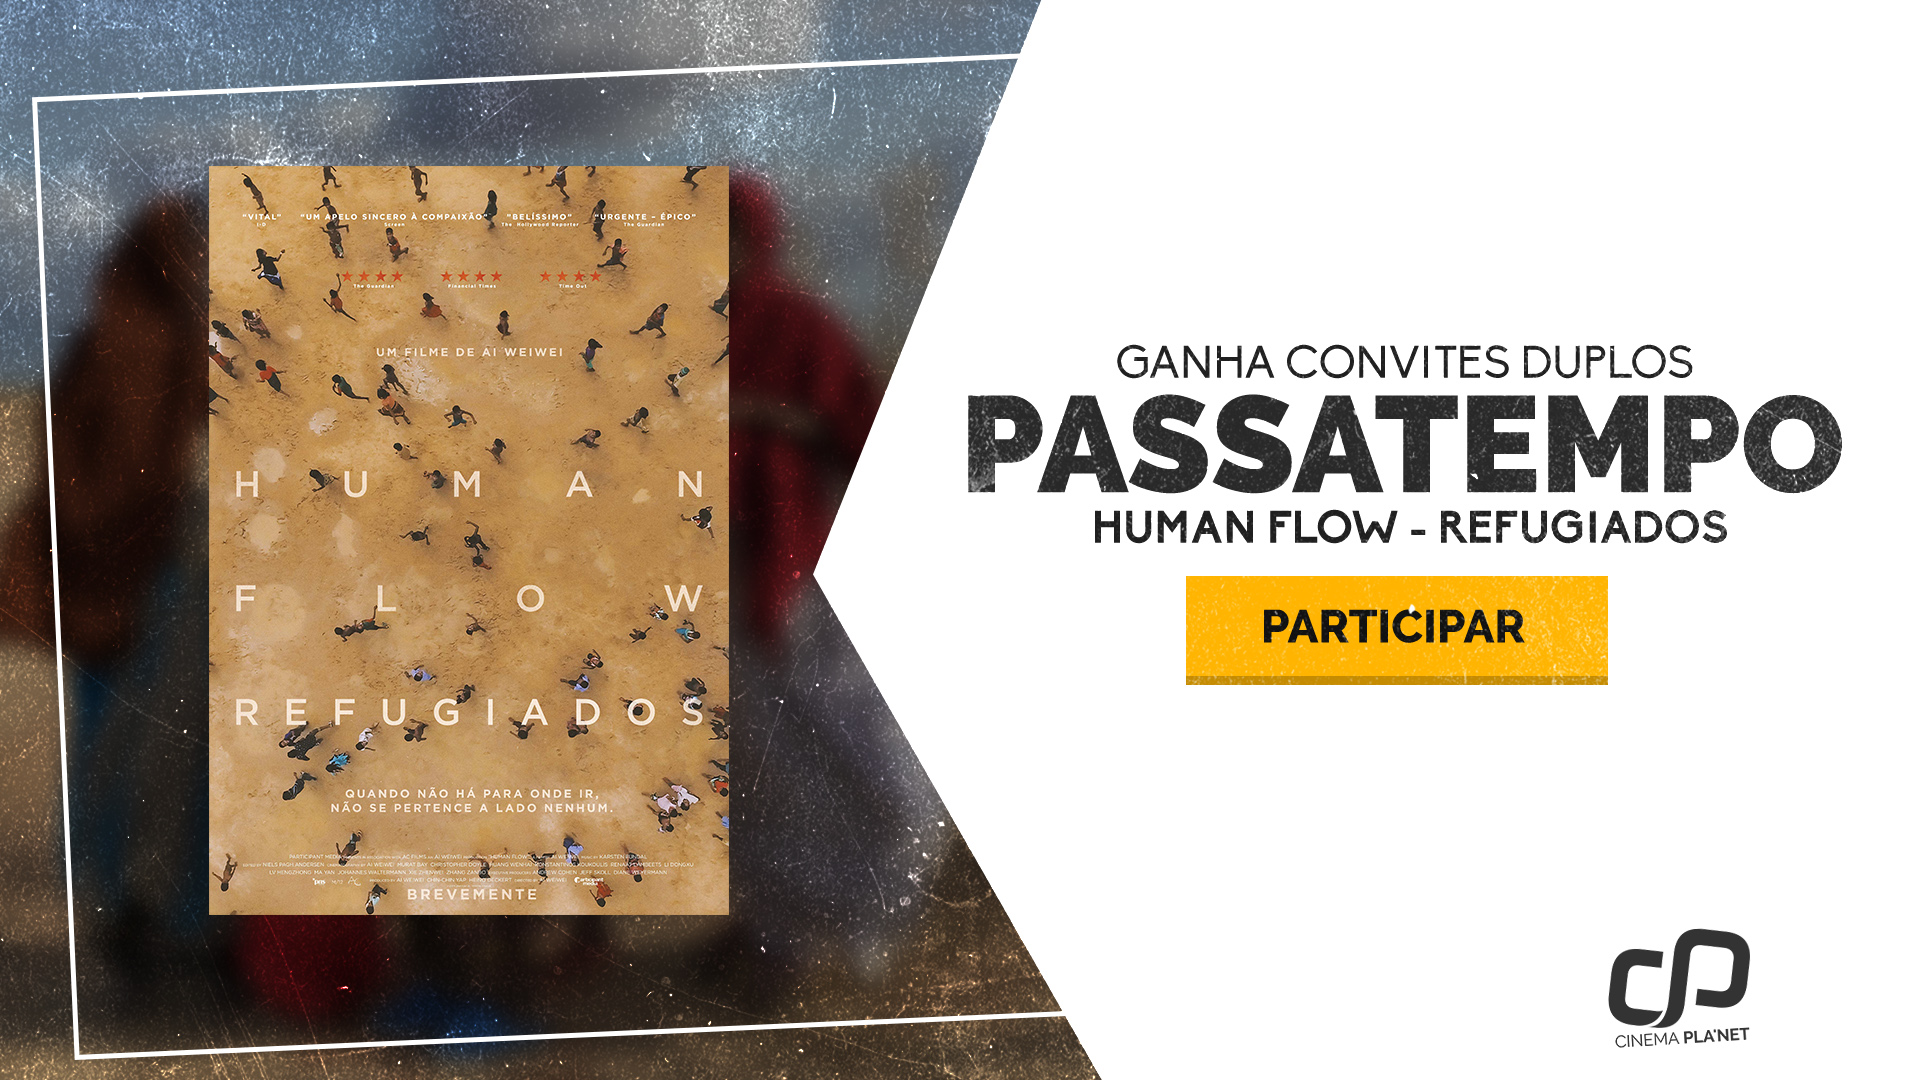 https://cinemaplanet.pt/wp-content/uploads/2018/05/passatempo_humanflow_refugiados.jpg